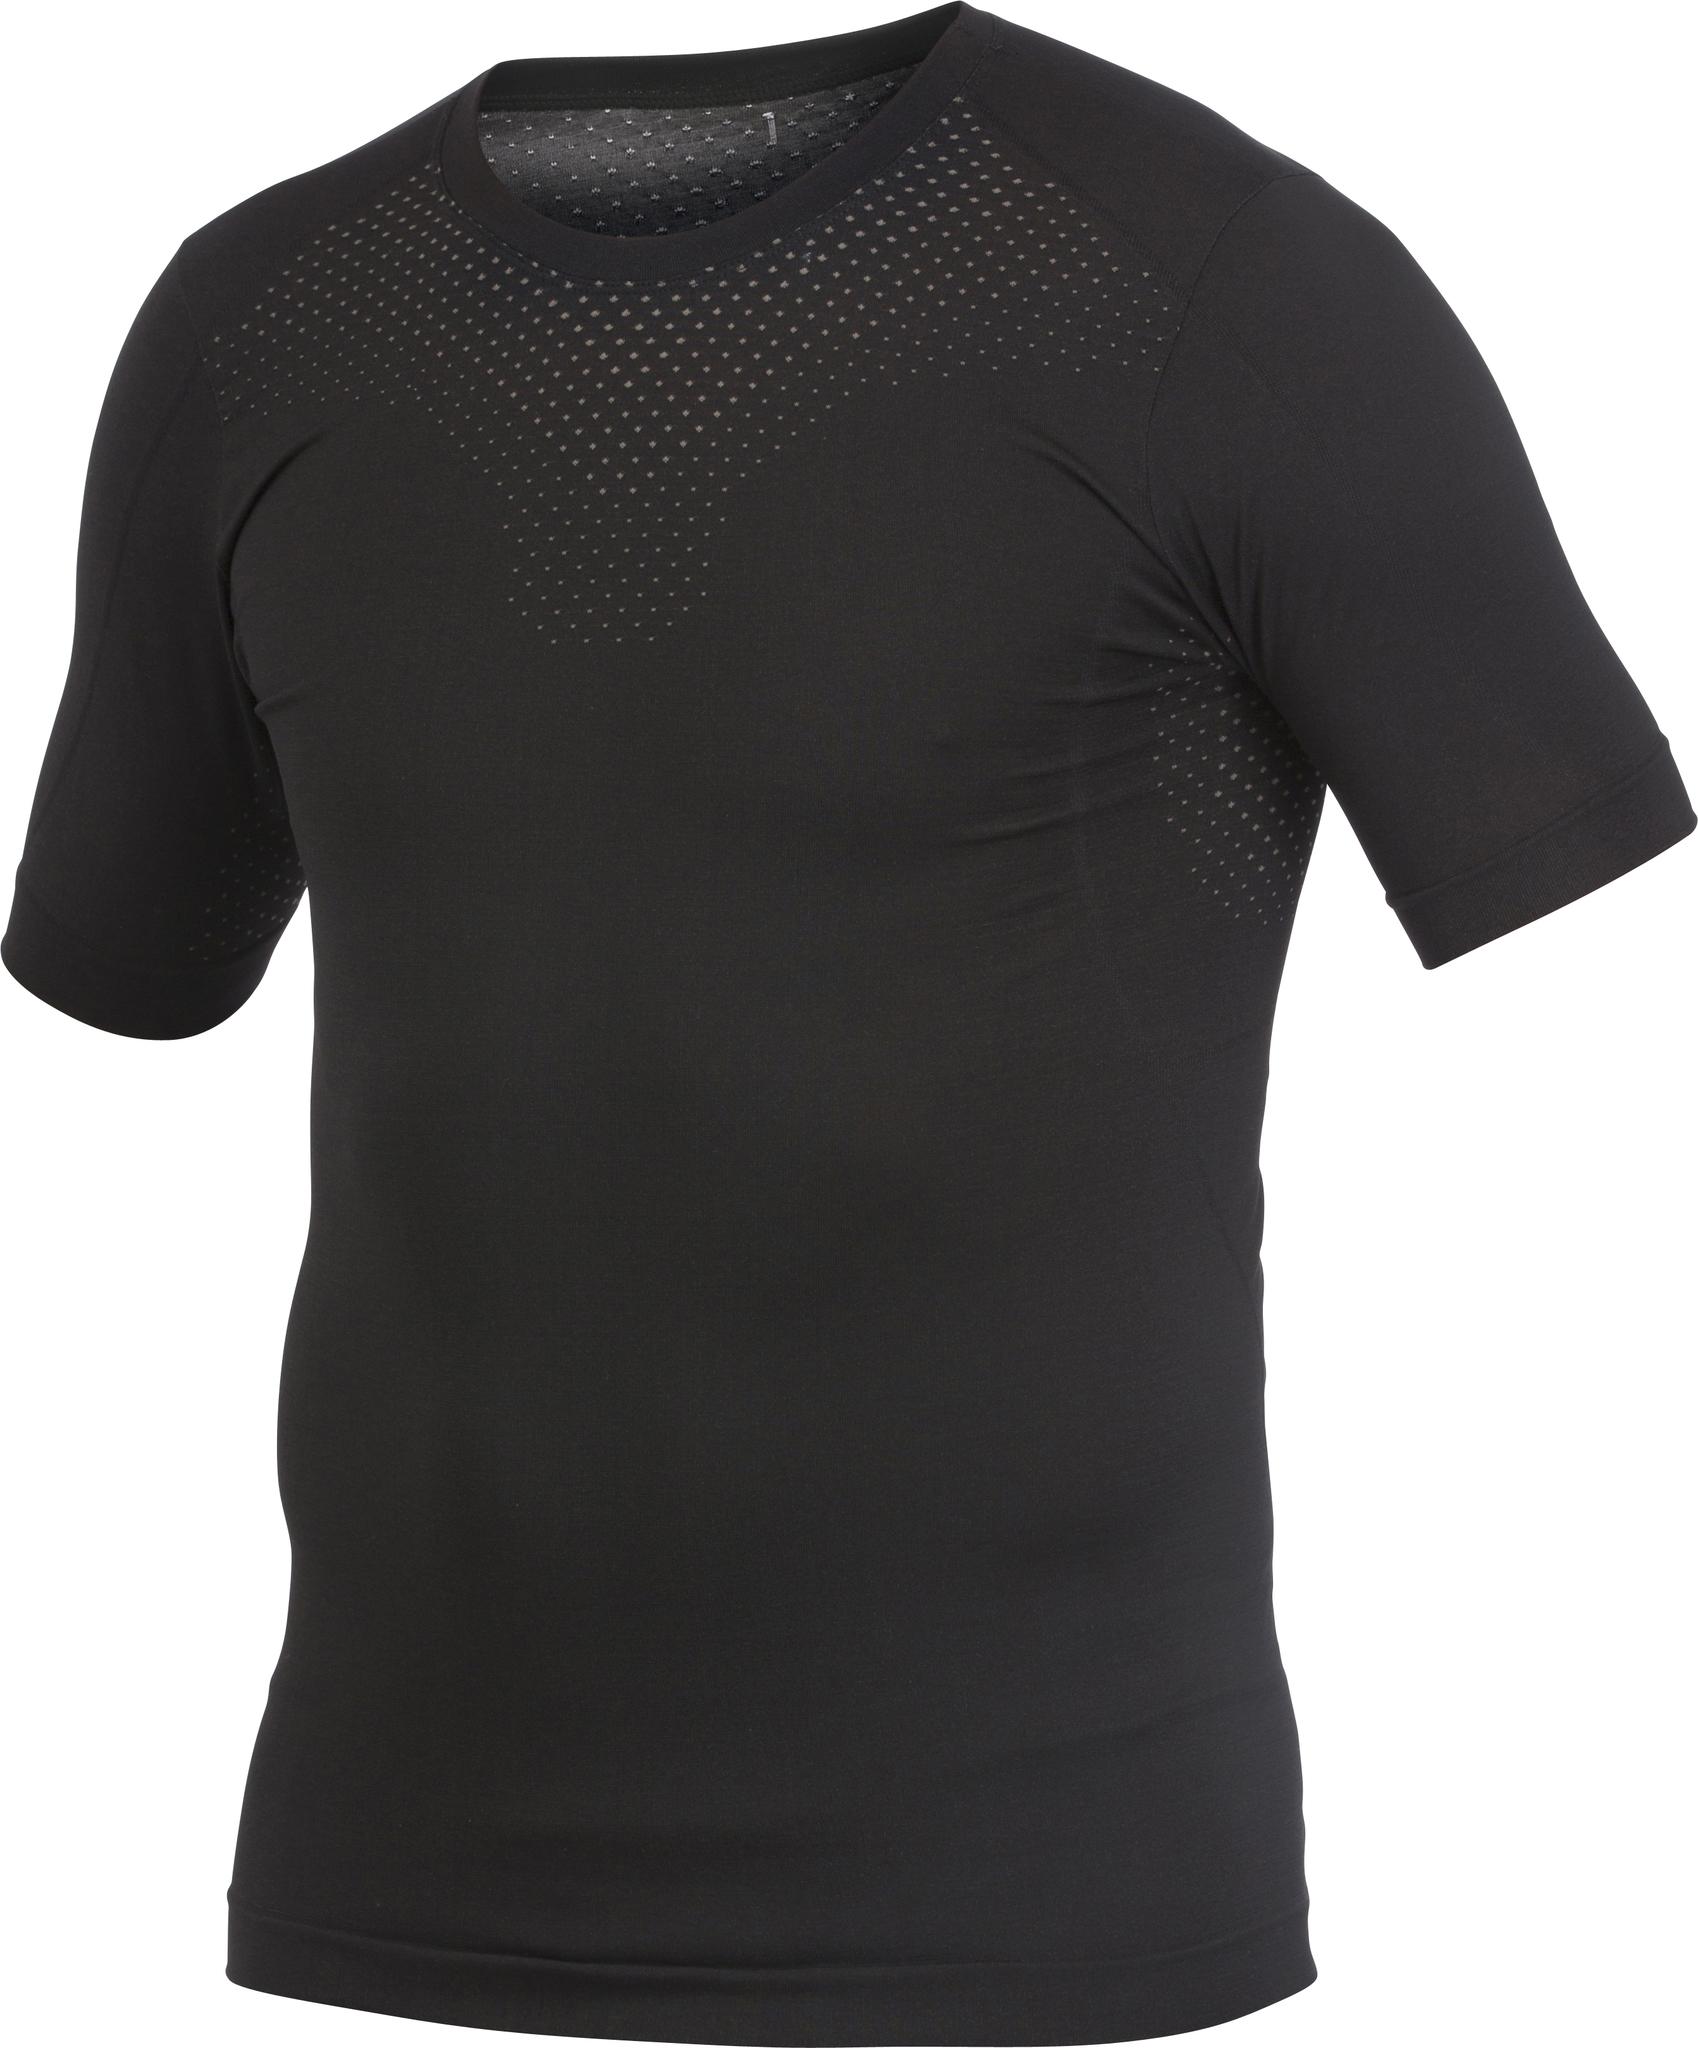 Футболка Craft Cool Seamless мужская черная